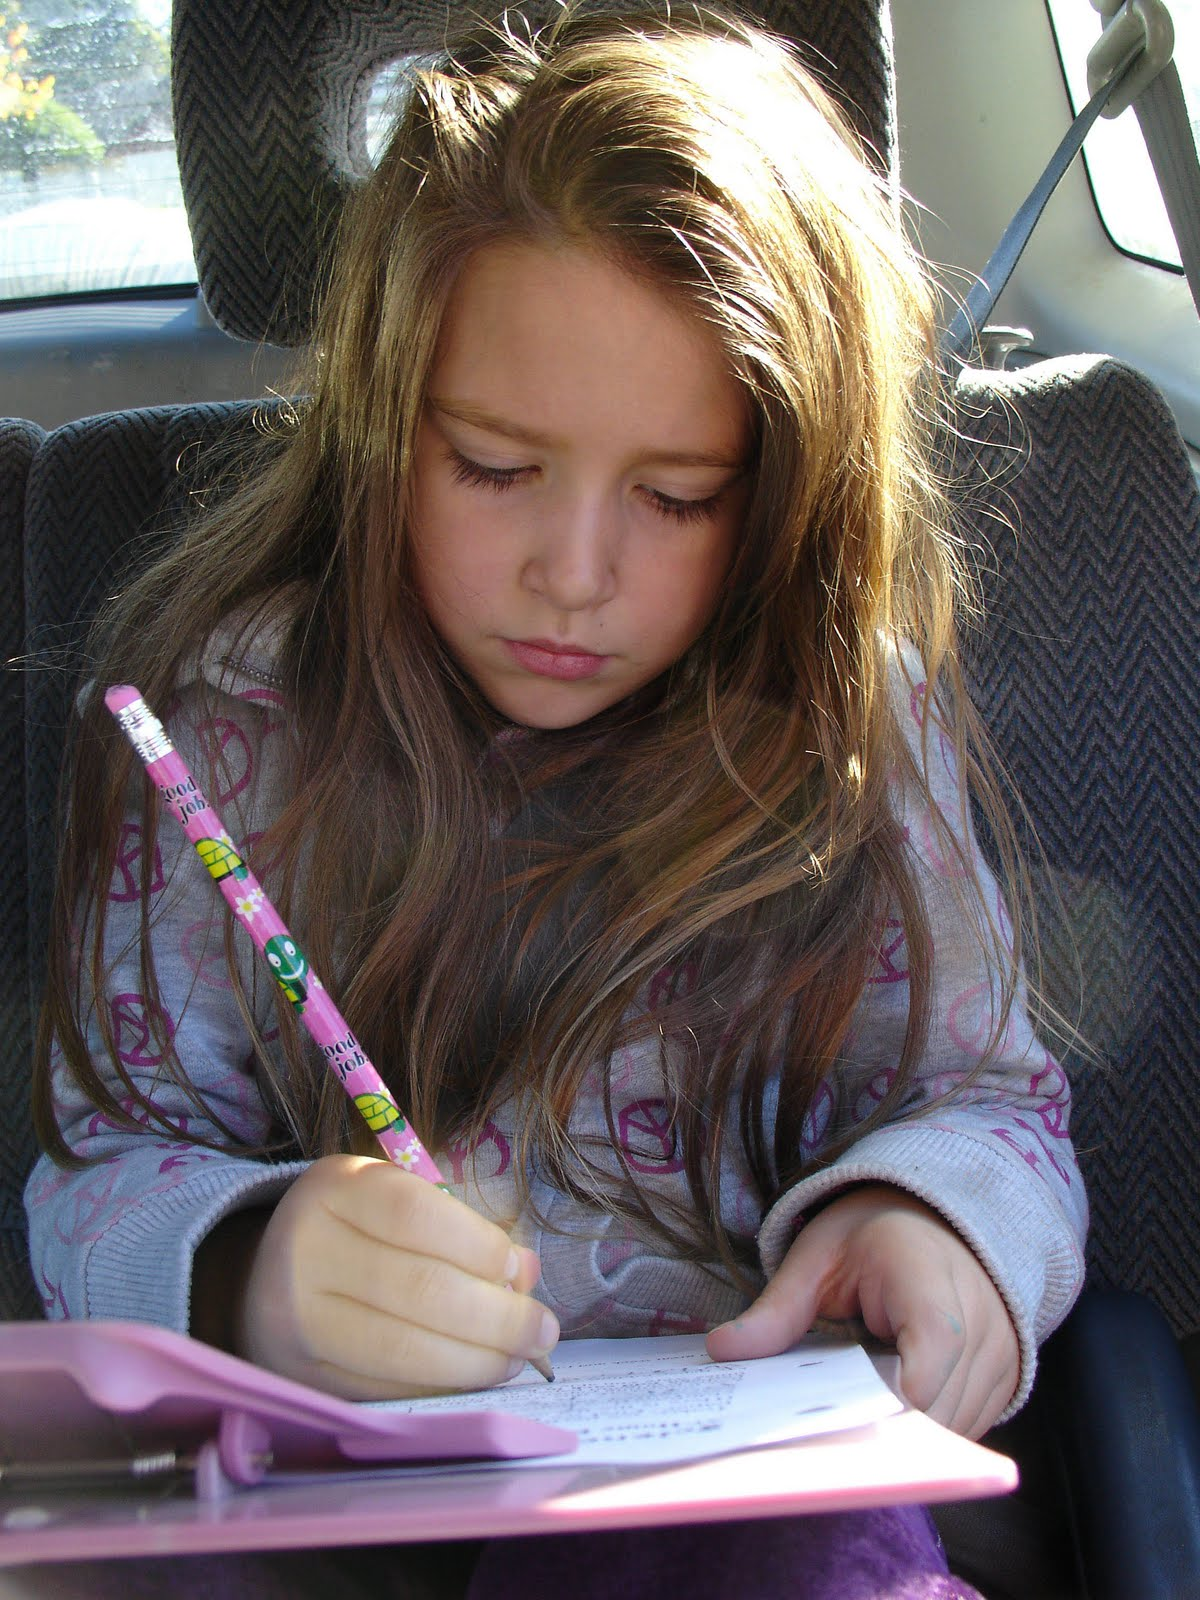 Homework help for parents cds